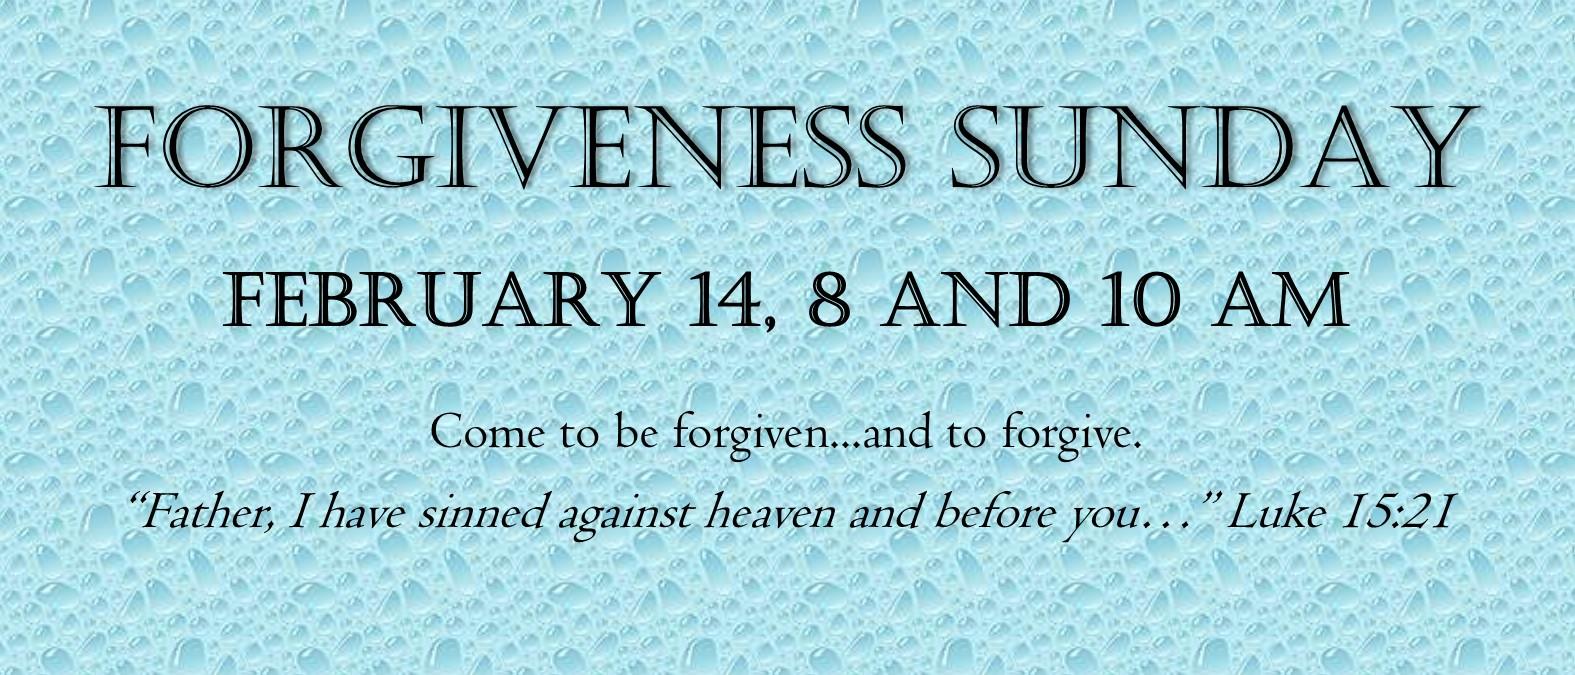 Forgiveness-Sunday-banner